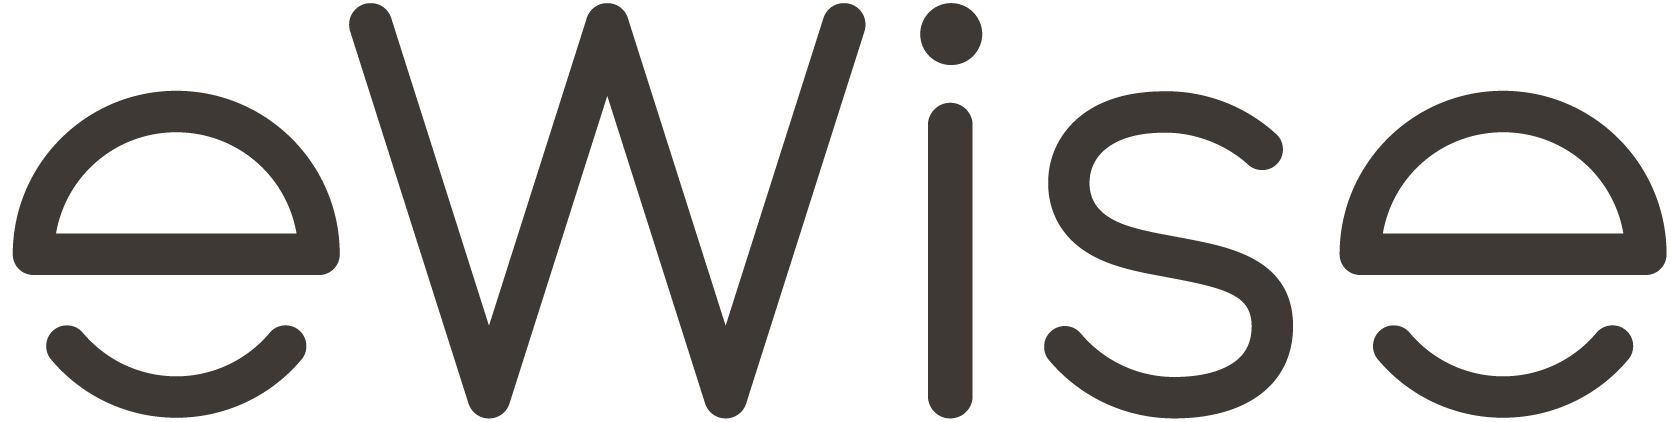 Ewise logo black